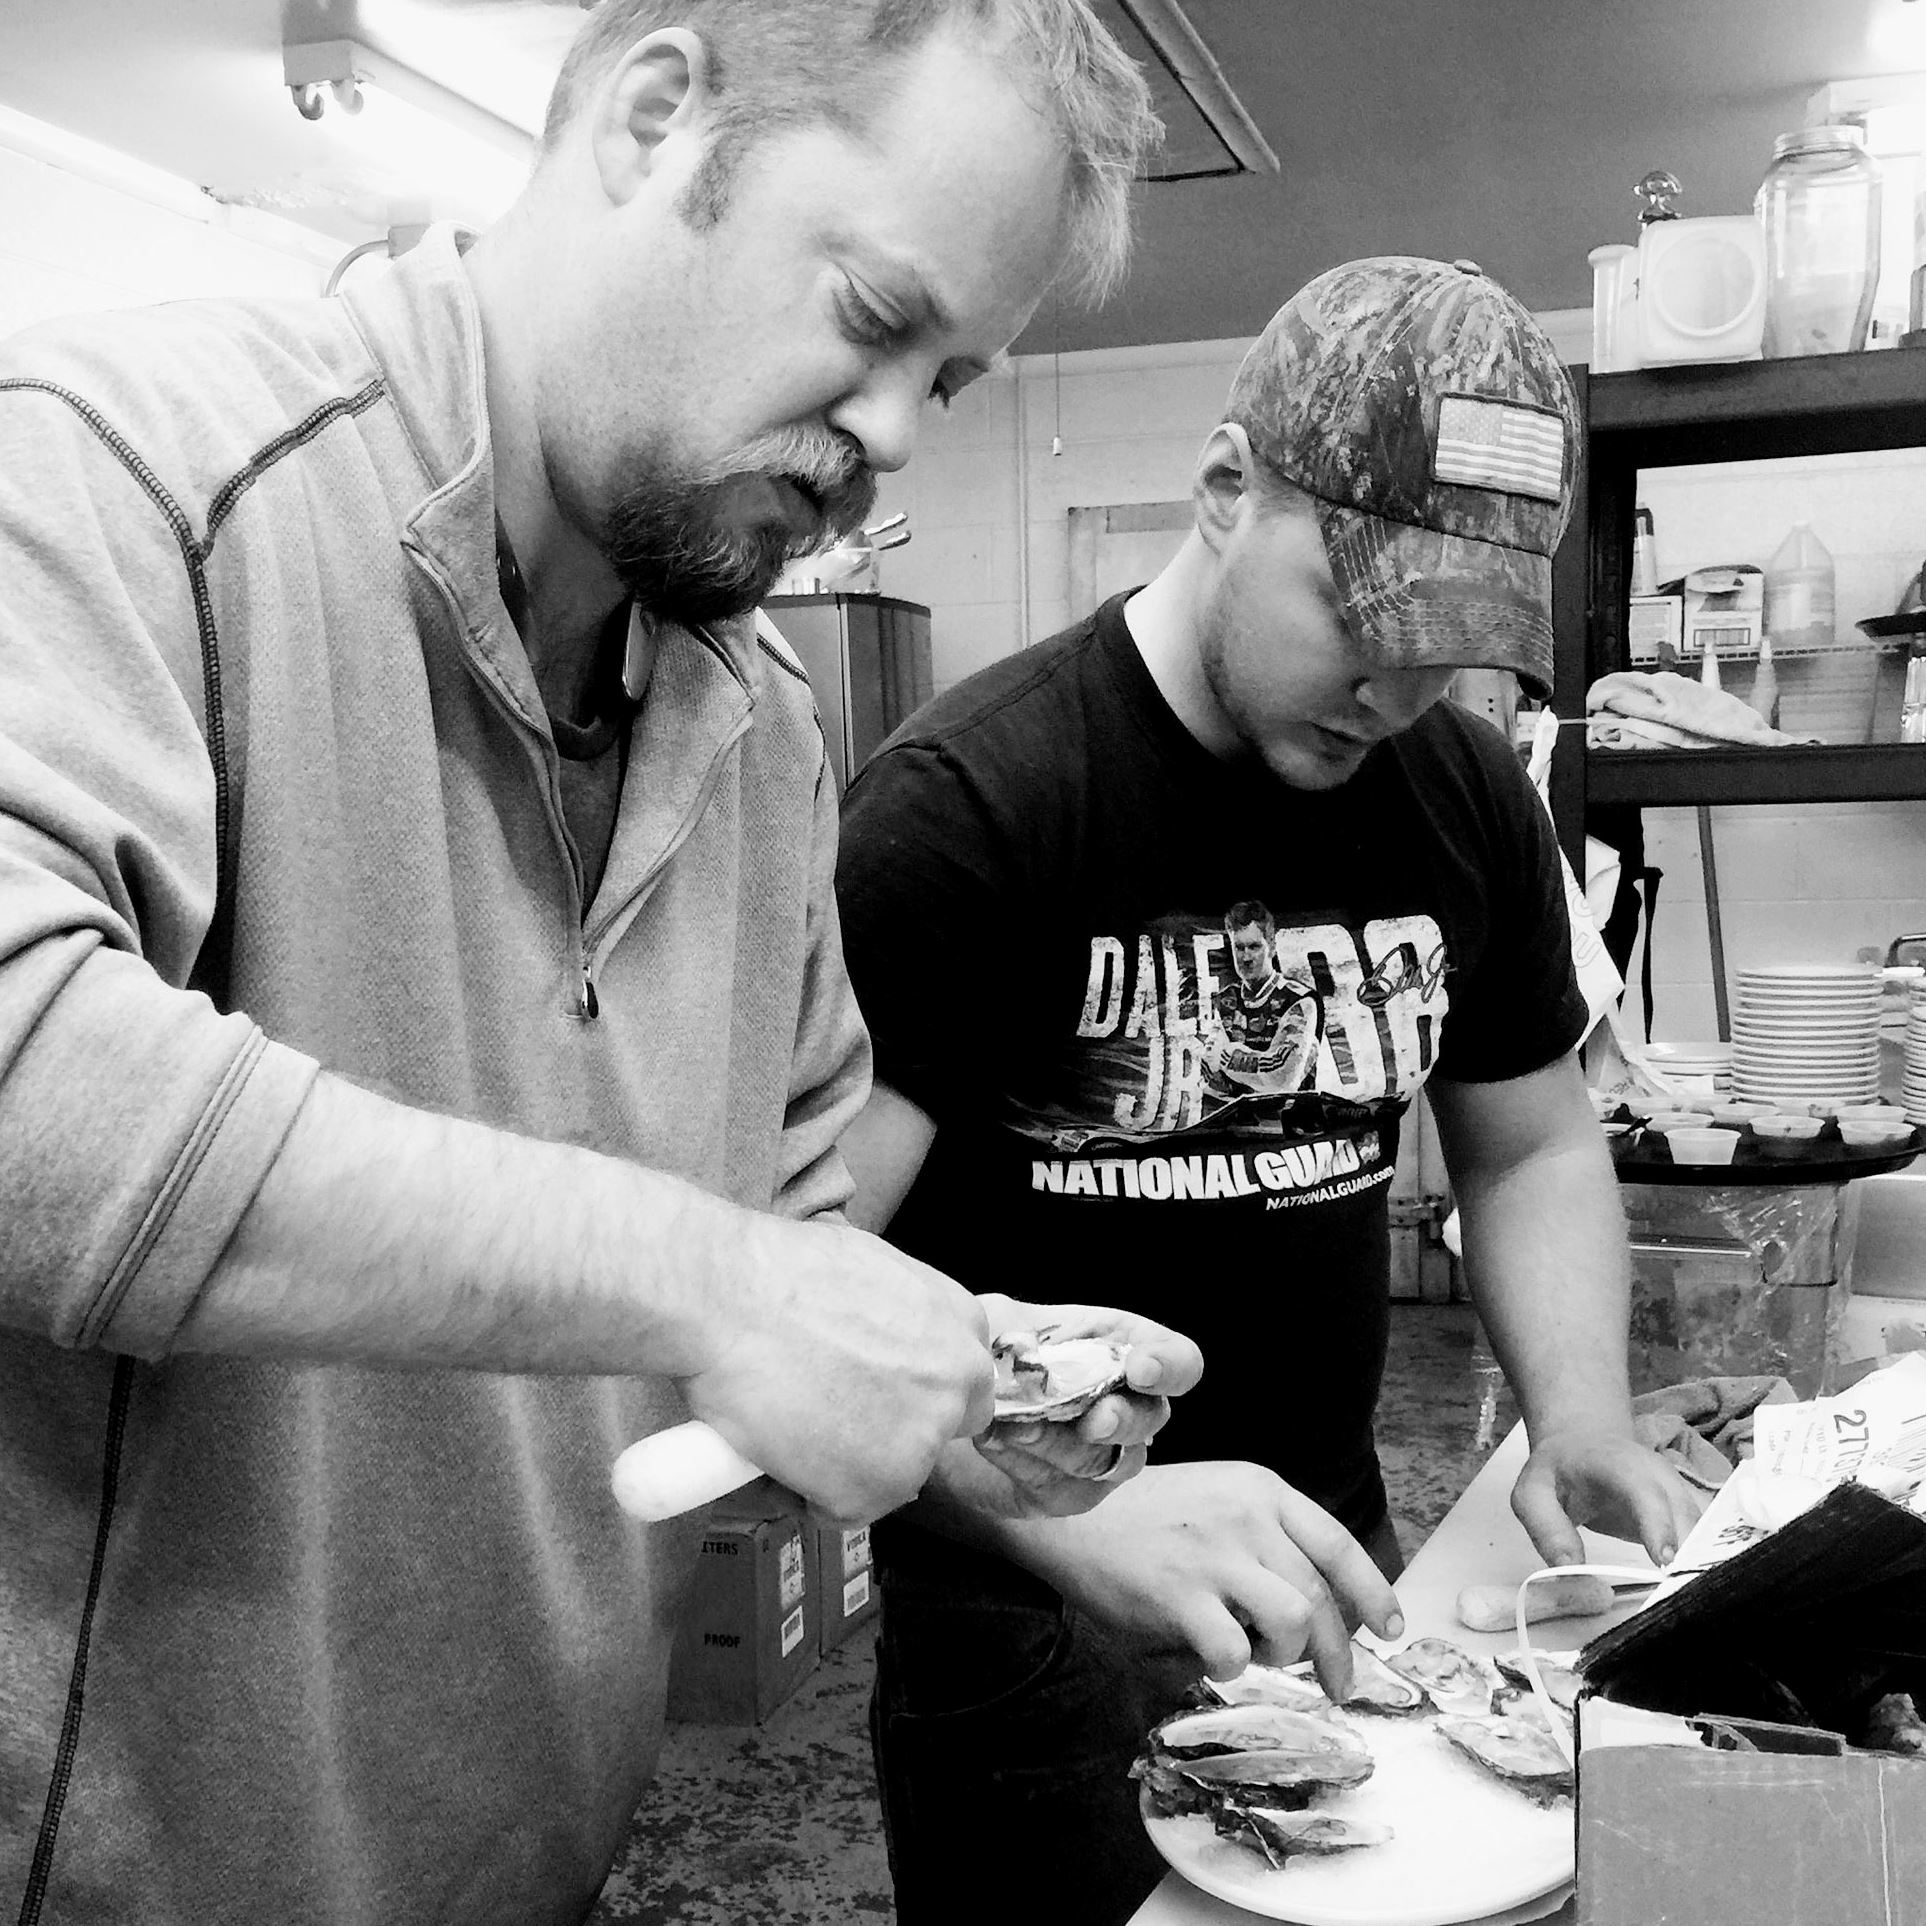 new deep creek wisp restaurant has close pittsburgh ties